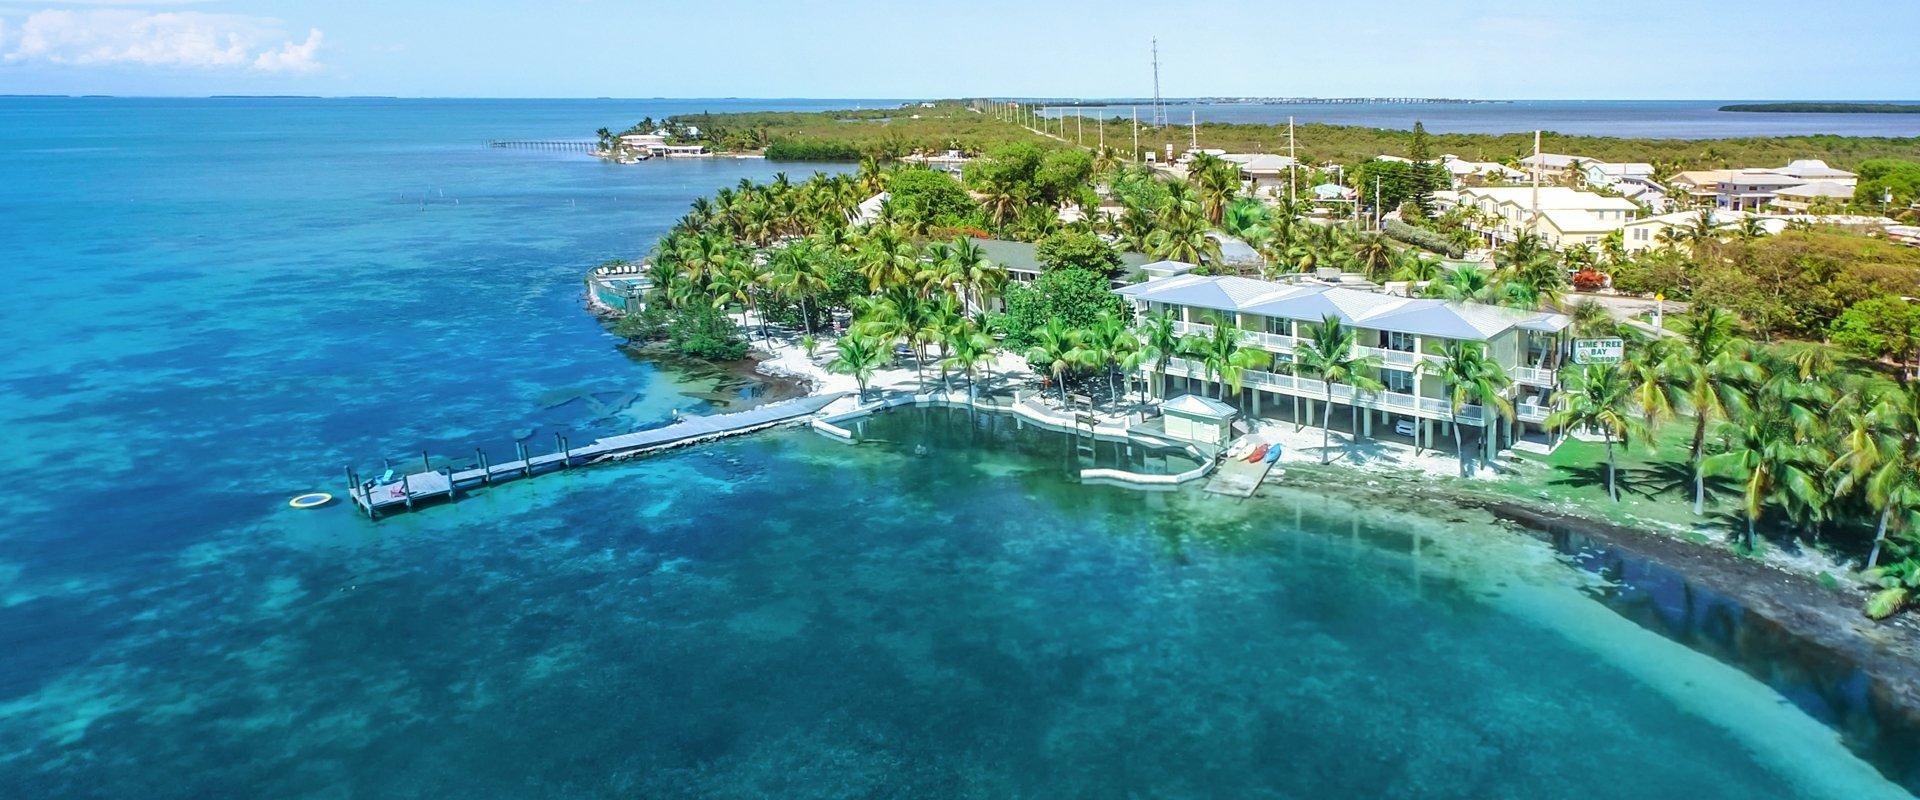 Lime Tree Bay Resort Official Site, Florida Keys Hotel, Islamorada - Map Of Florida Keys Resorts